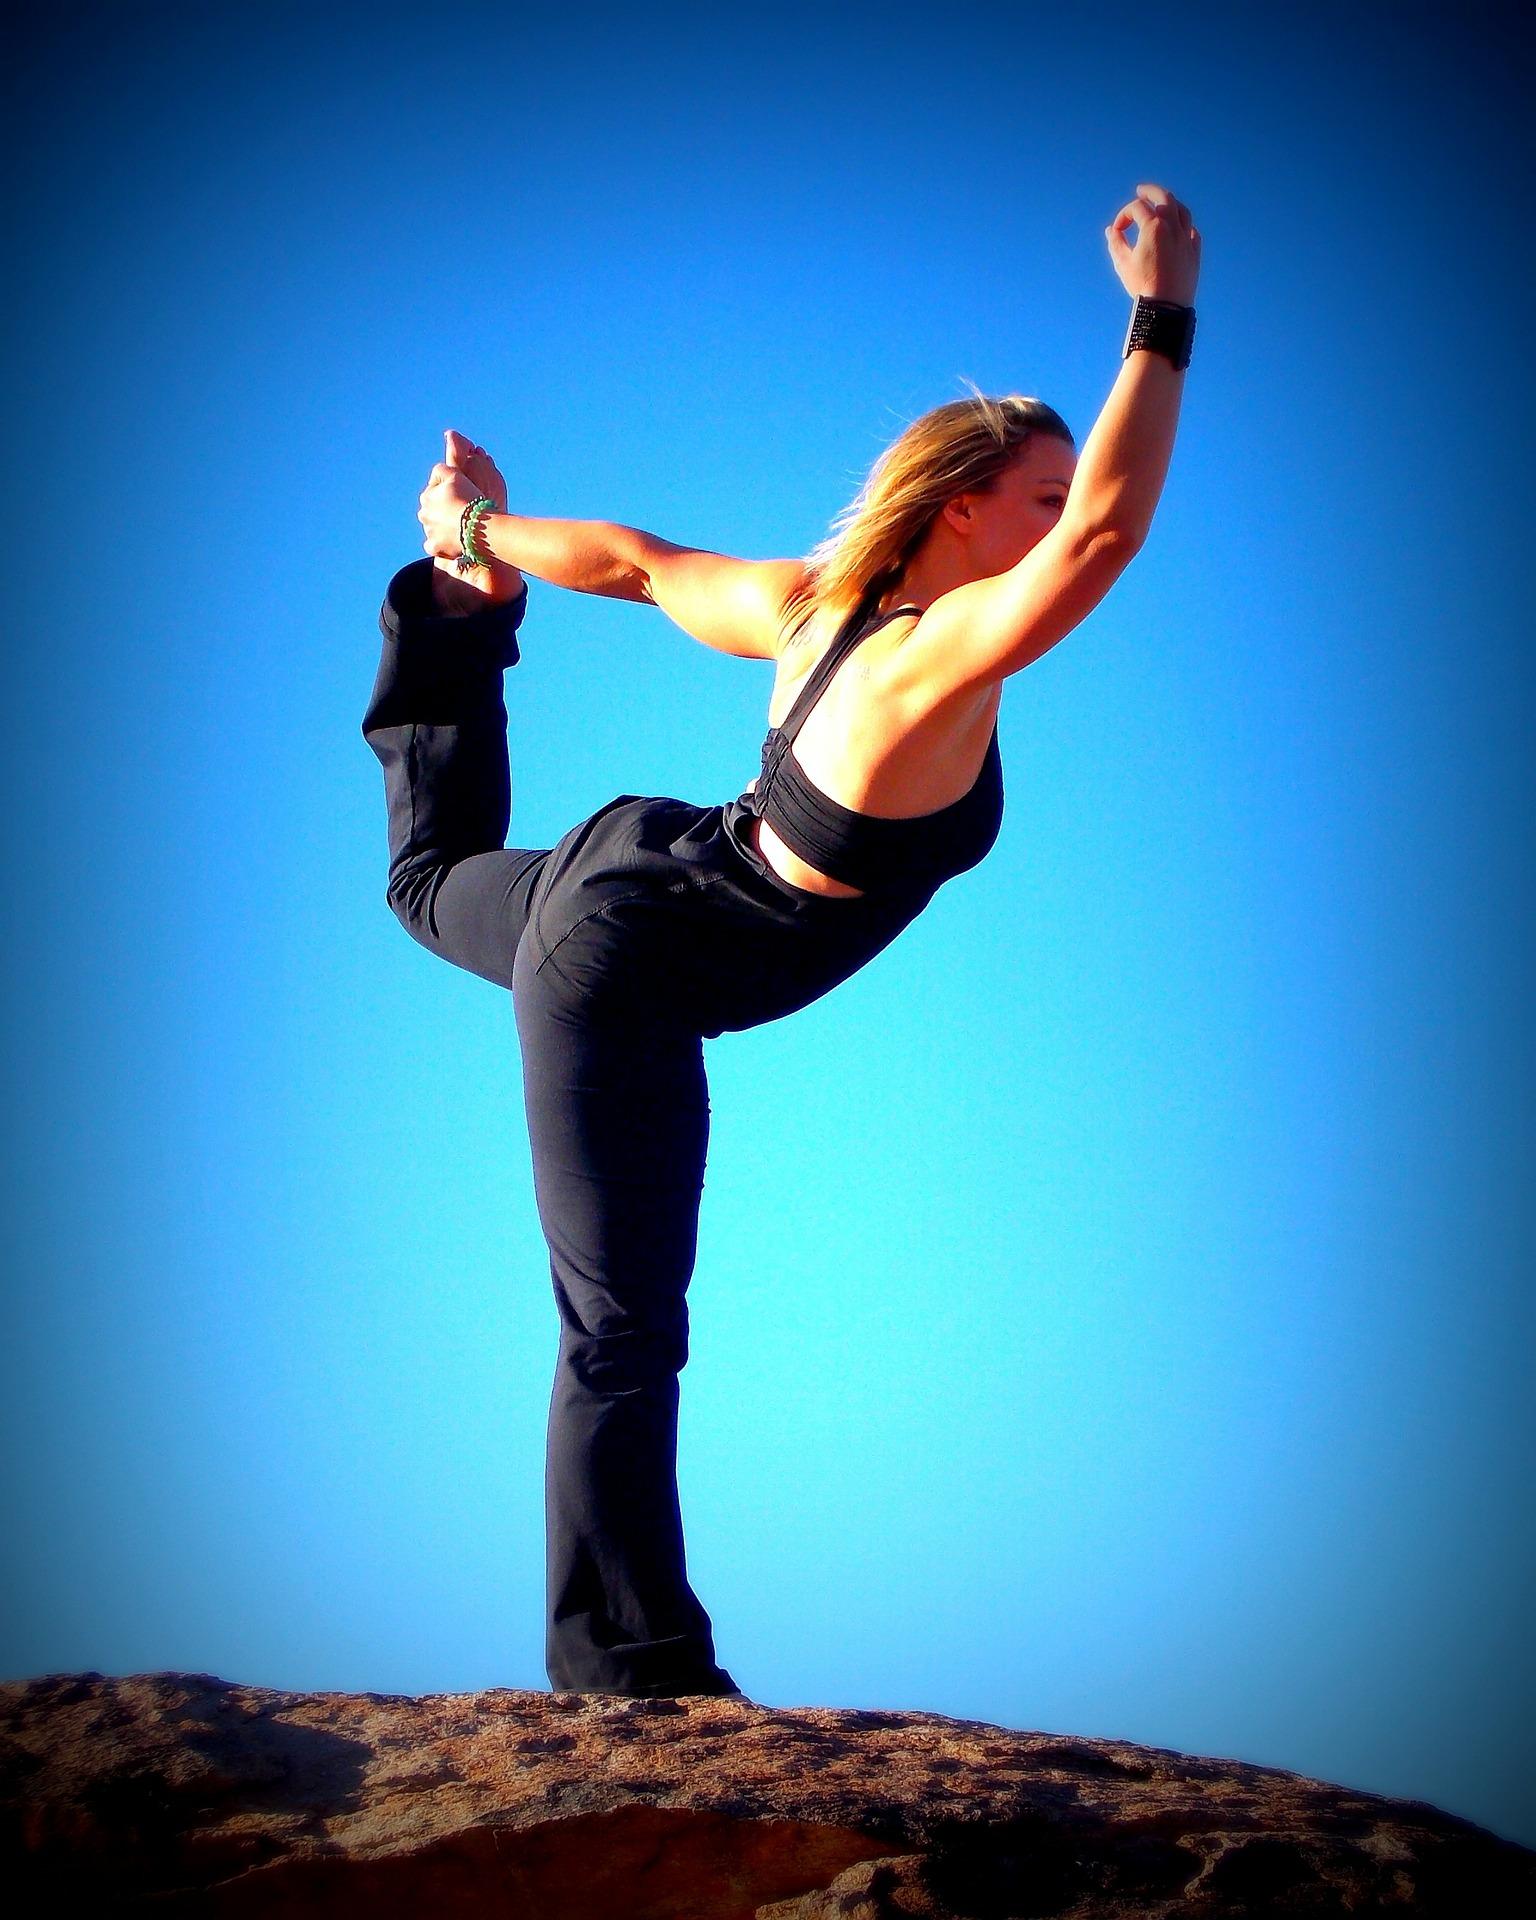 chica-practicando-yoga-aire-libre